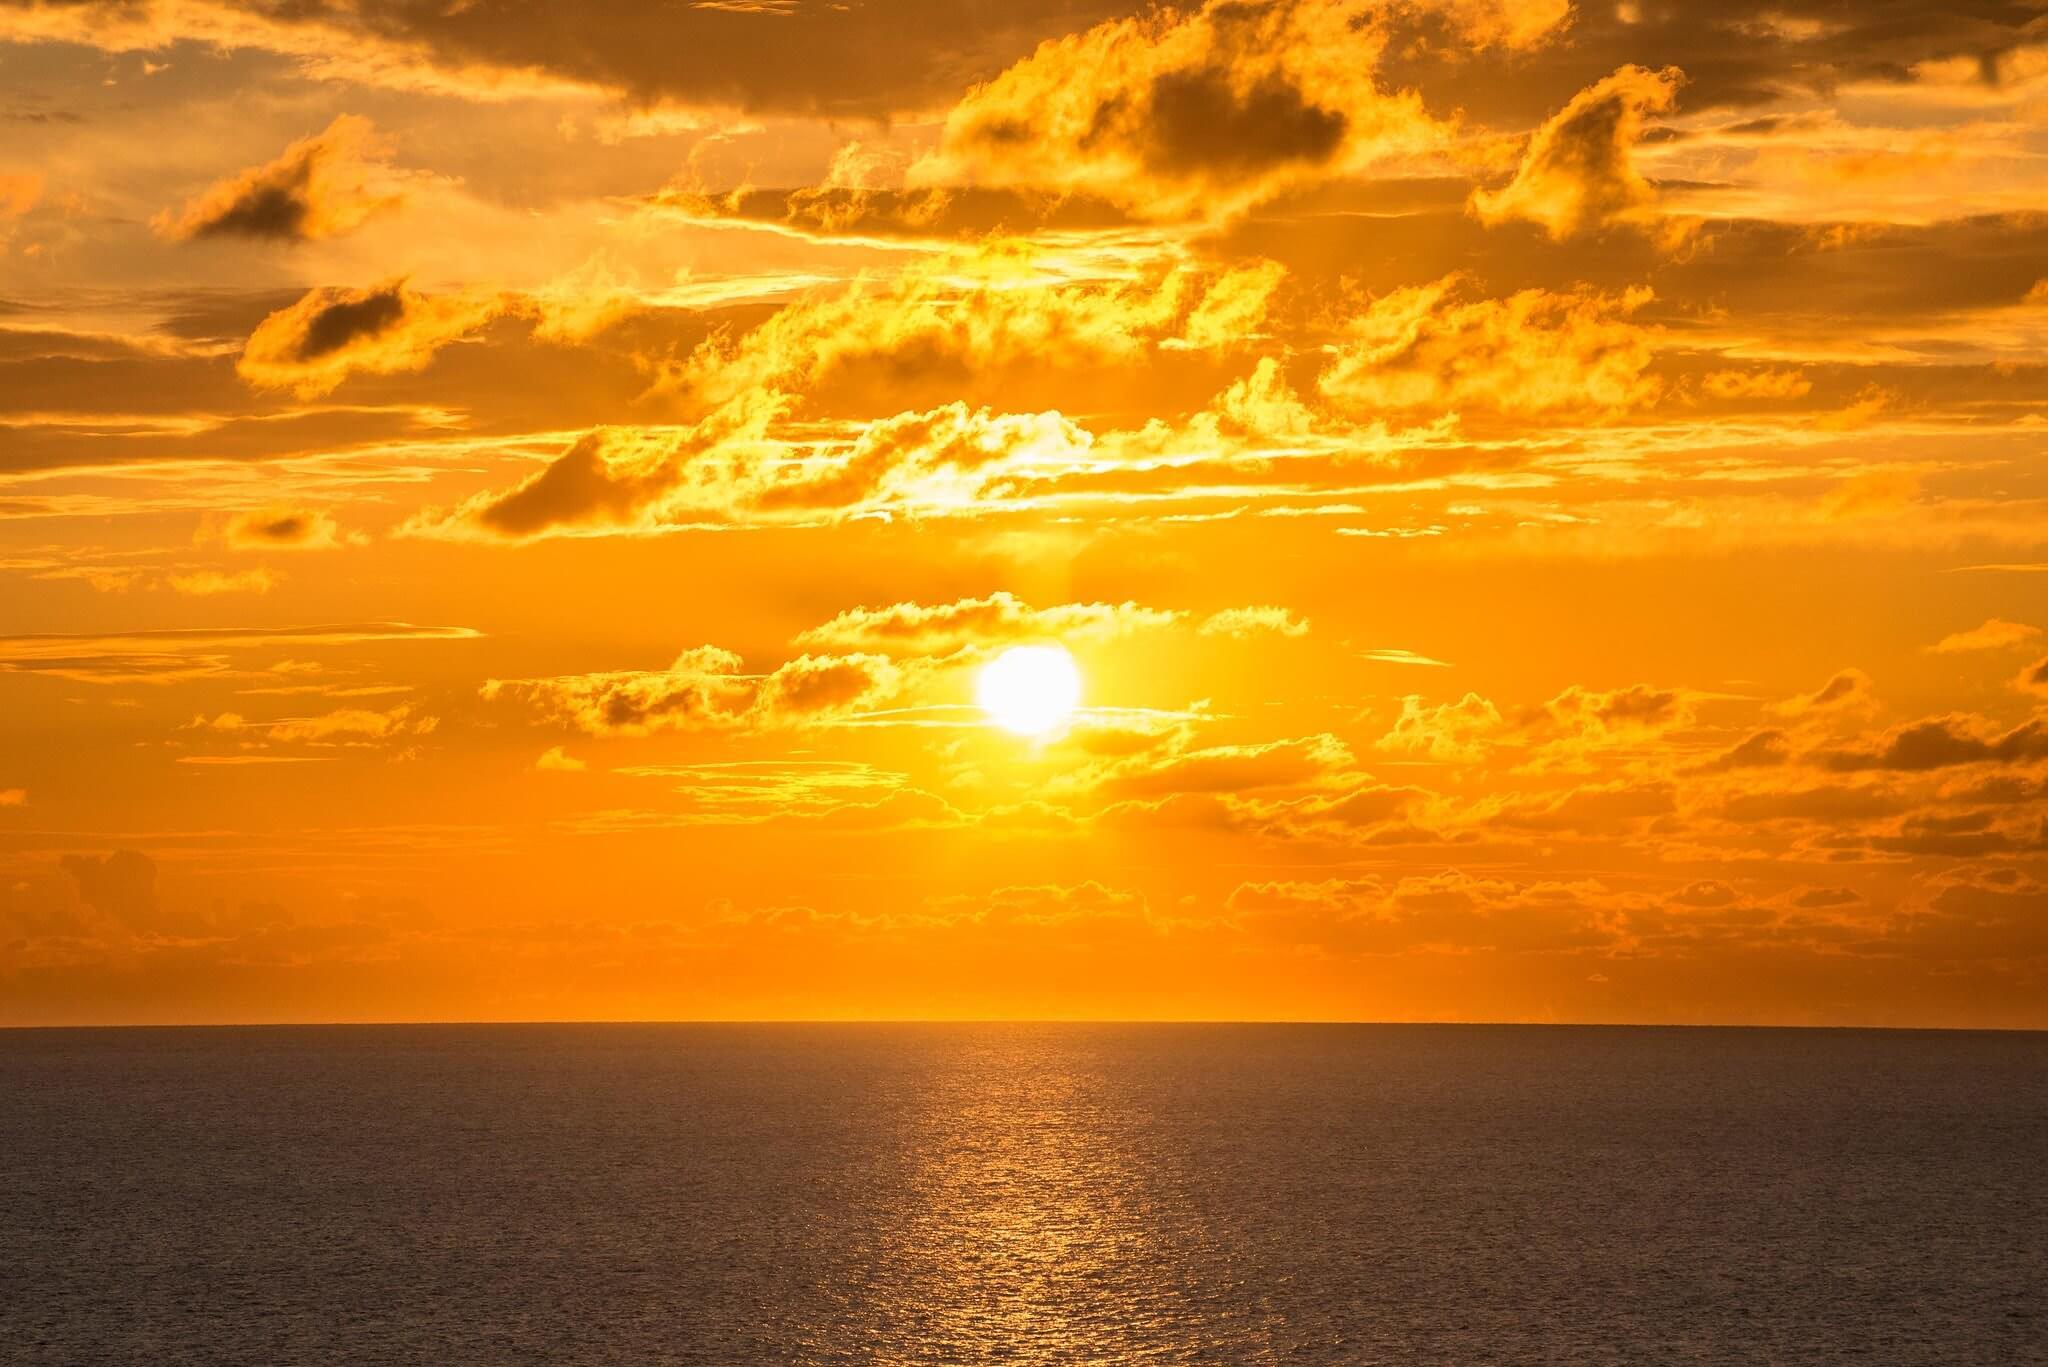 https://www.white-ibiza.com/wp-content/uploads/2020/03/ibiza-sunsets-la-torre-ibiza-2020-01.jpg